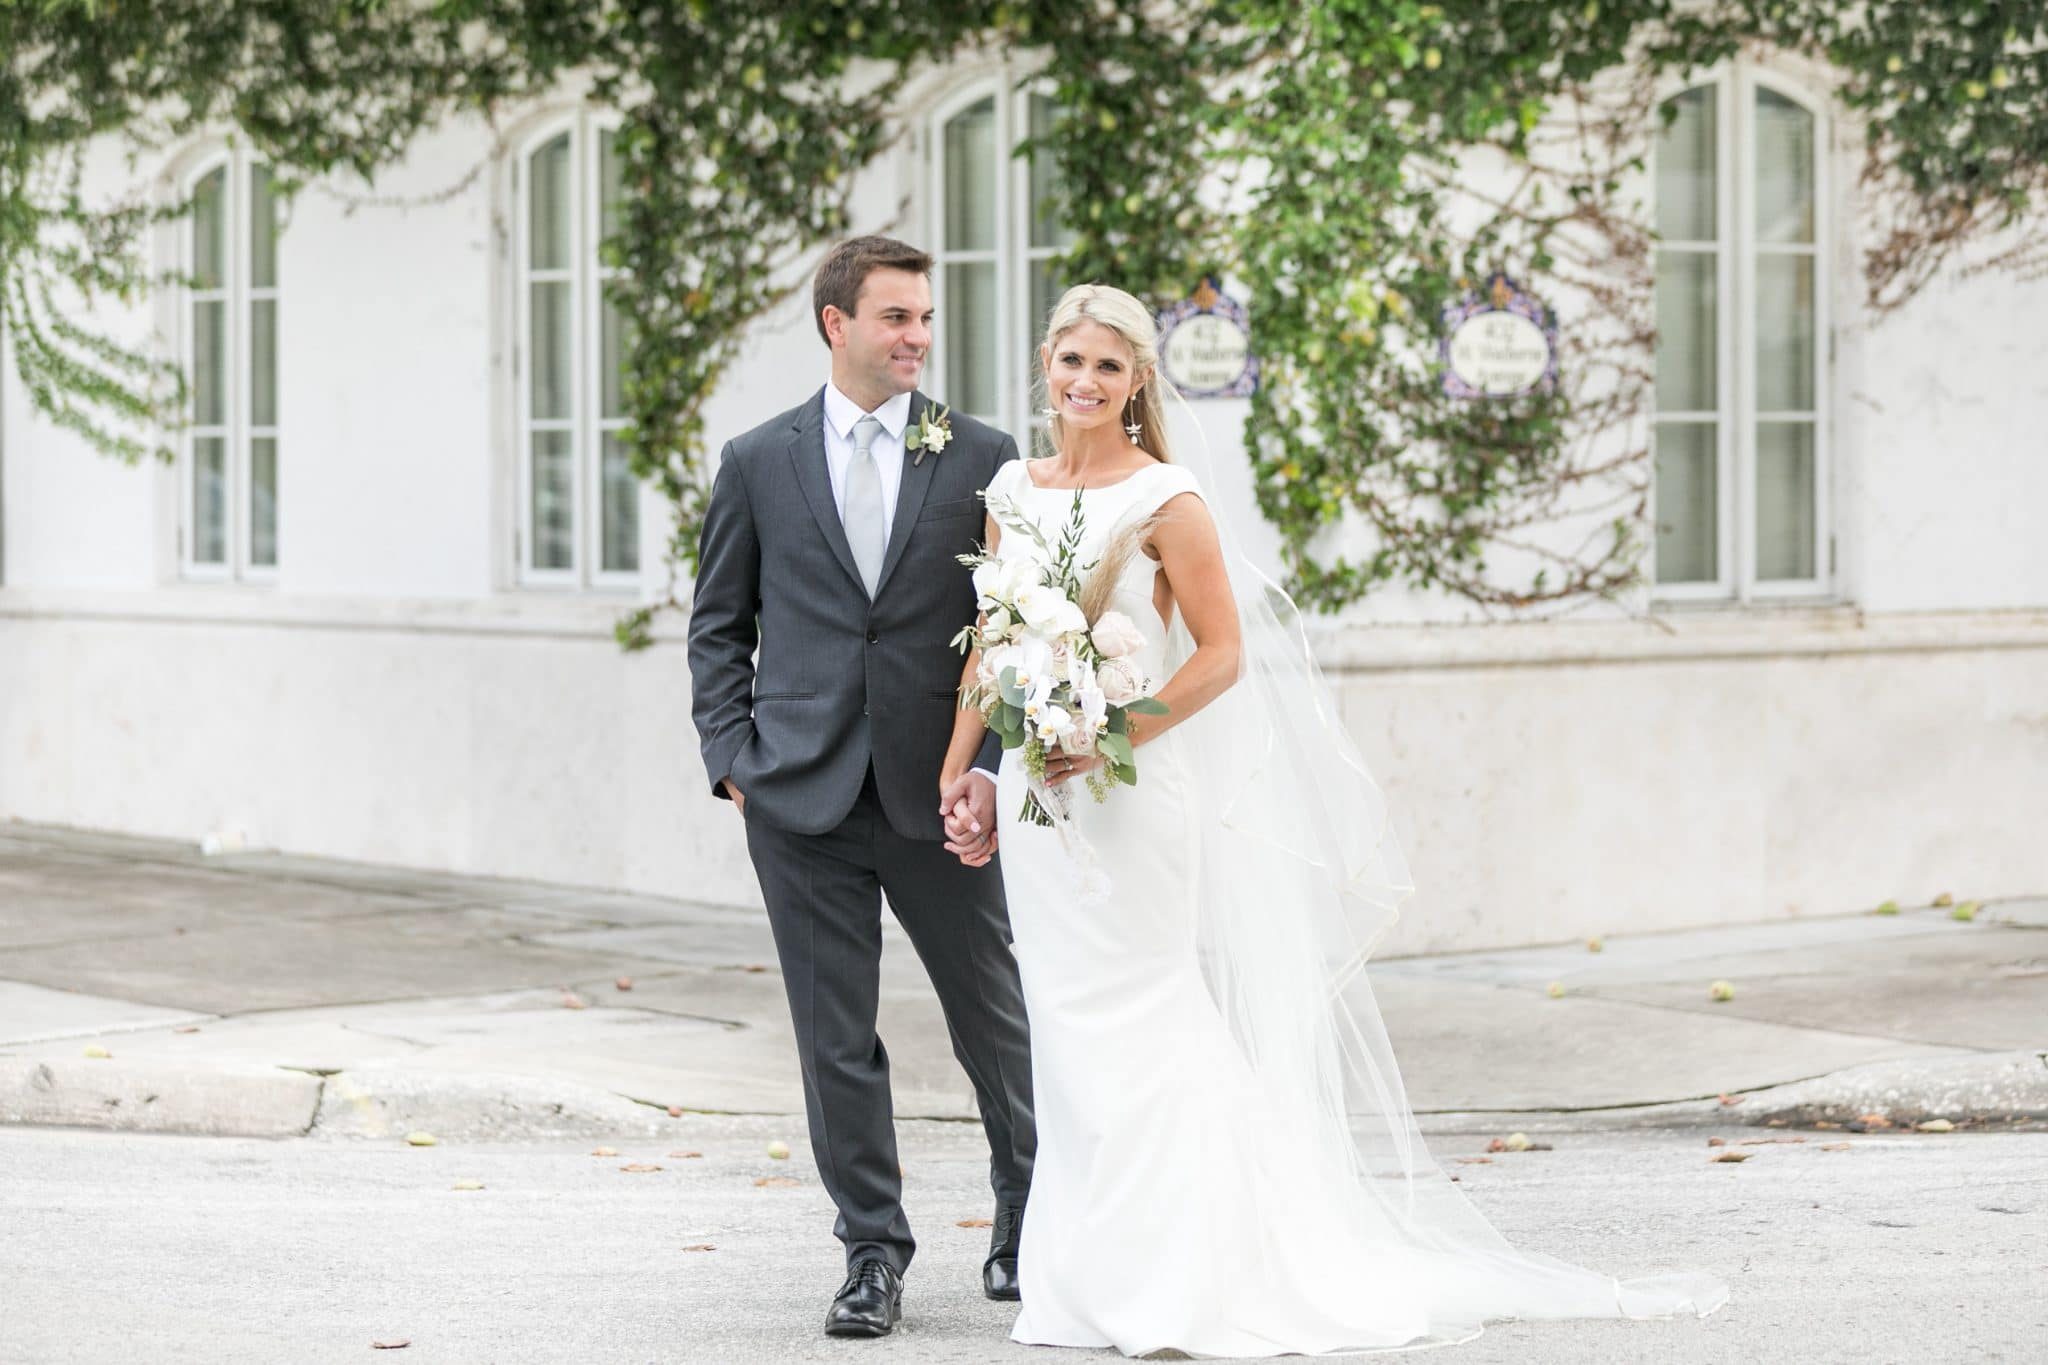 Orlando Wedding Florist - Bluegrass Chic